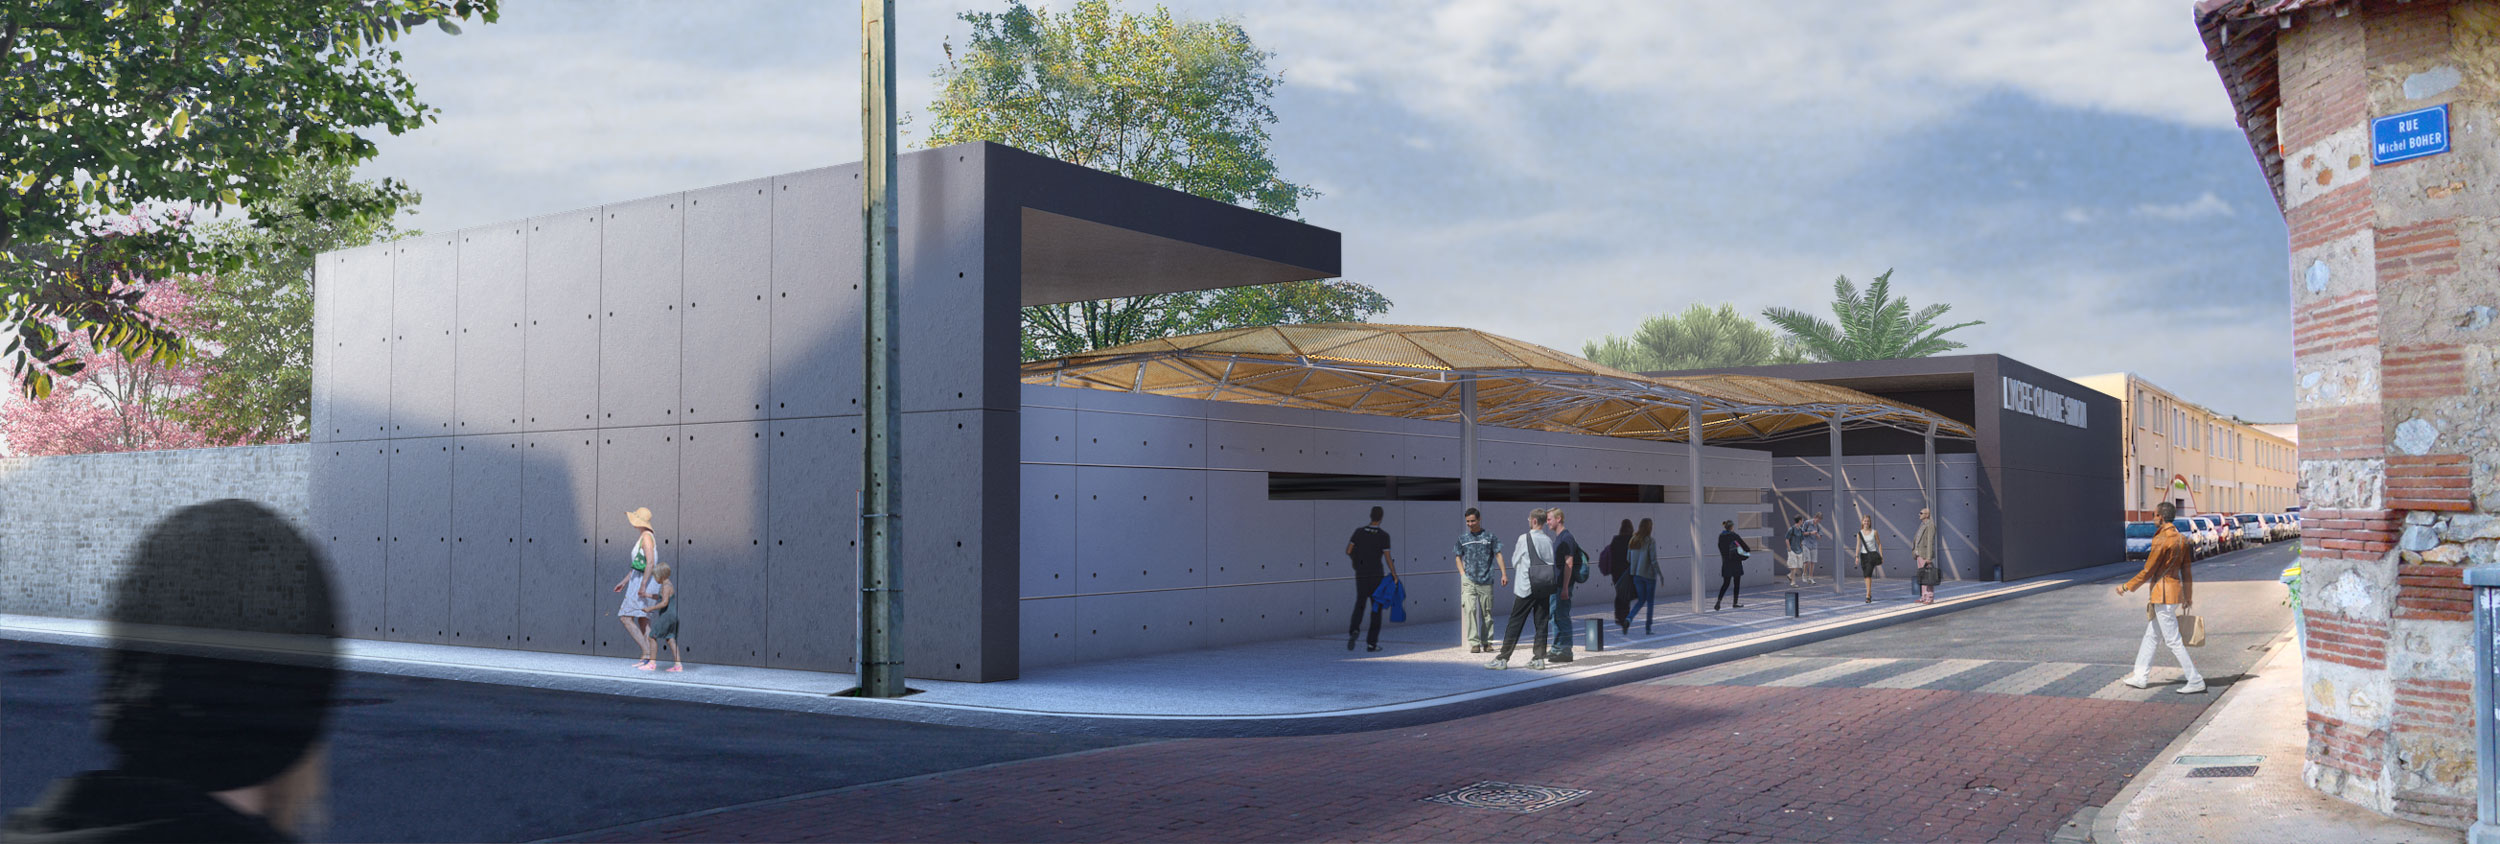 Alagheband Partner's projet Architecture Lycée Rivesaltes 2013